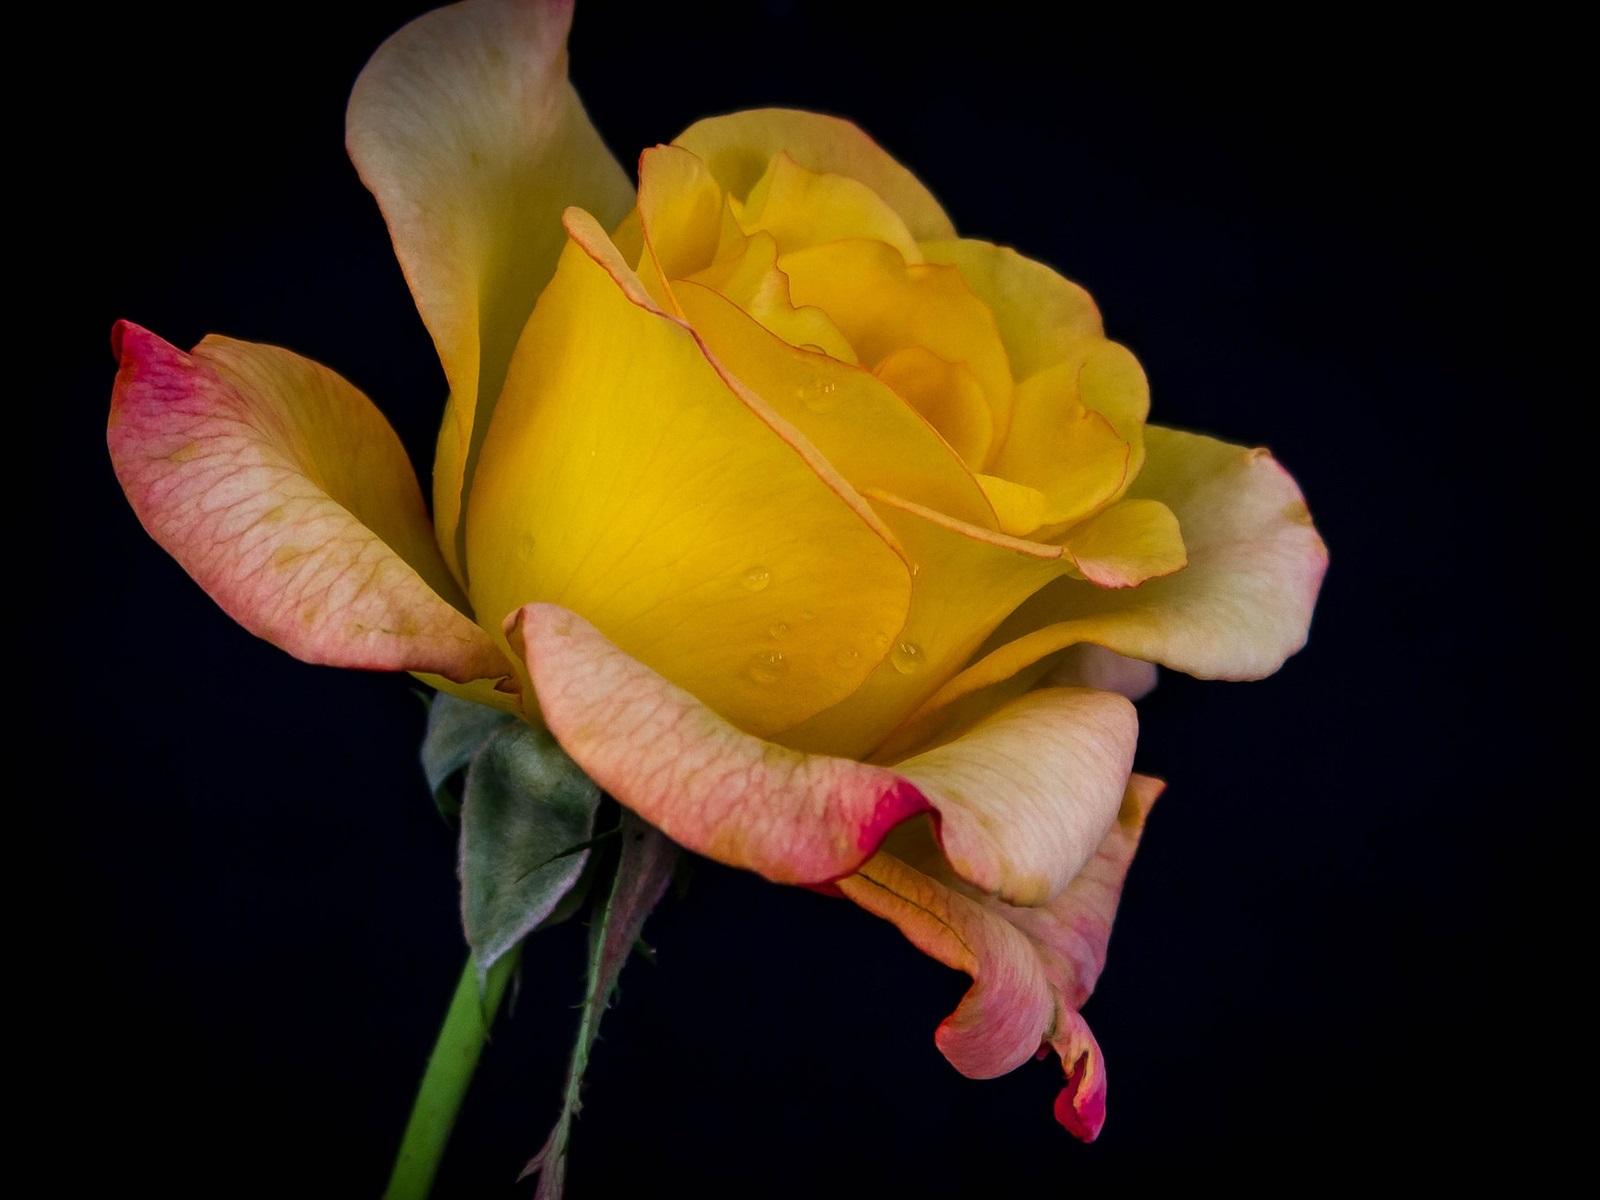 Картинки желтая роза на черном фоне